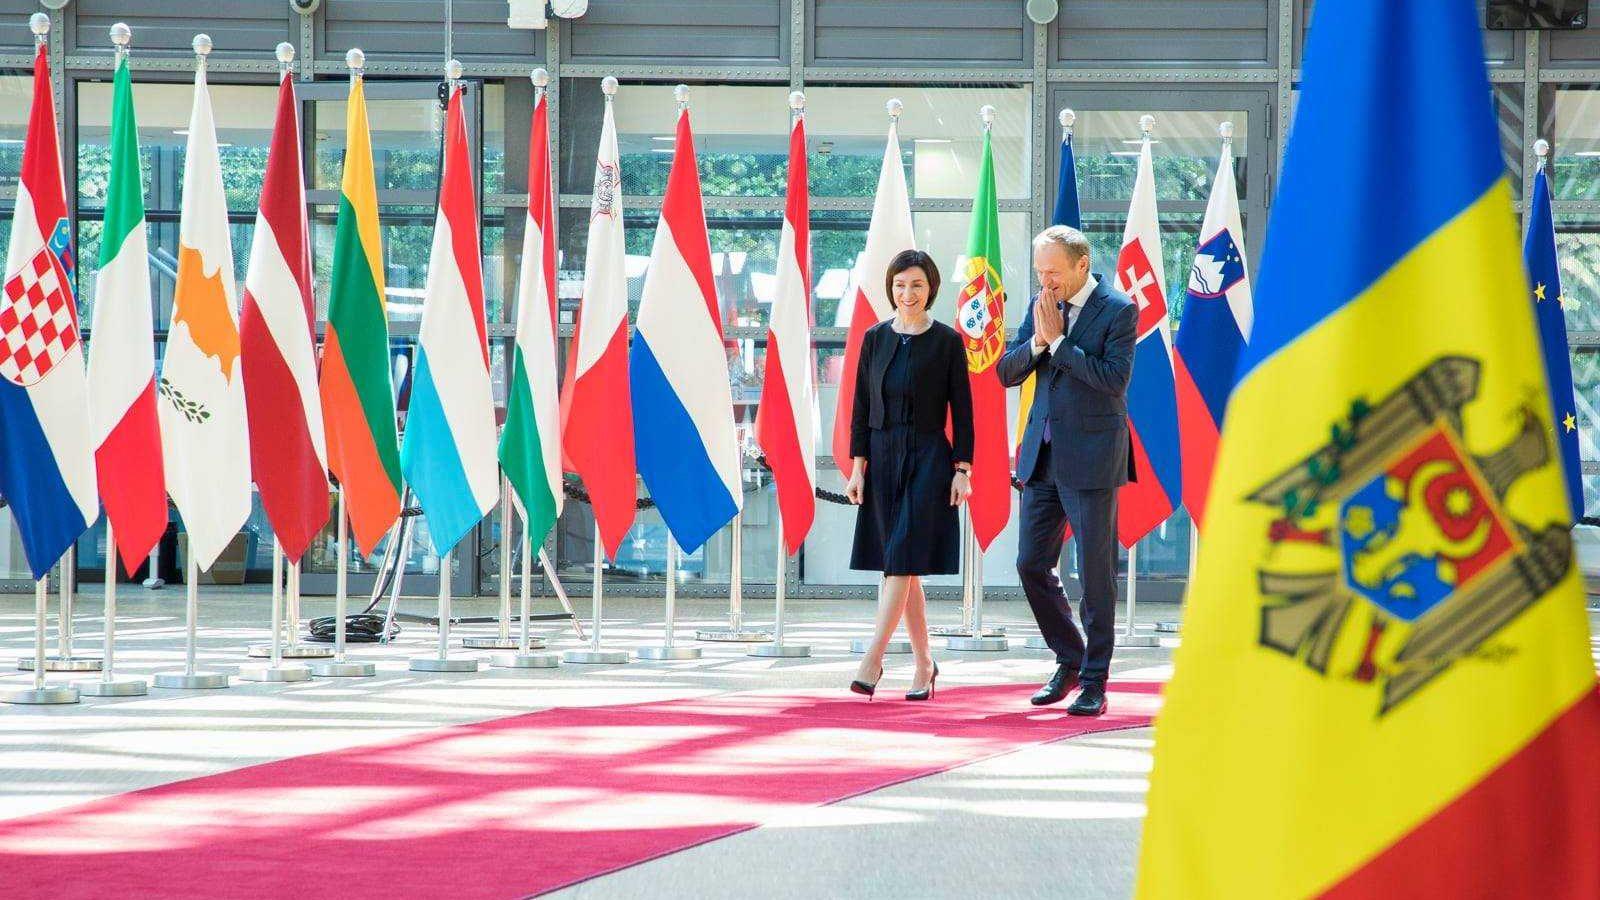 Photo: Maia Sandu meets with former EU Commission President Donald Tusk. Credit: Maia Sandu Facebook